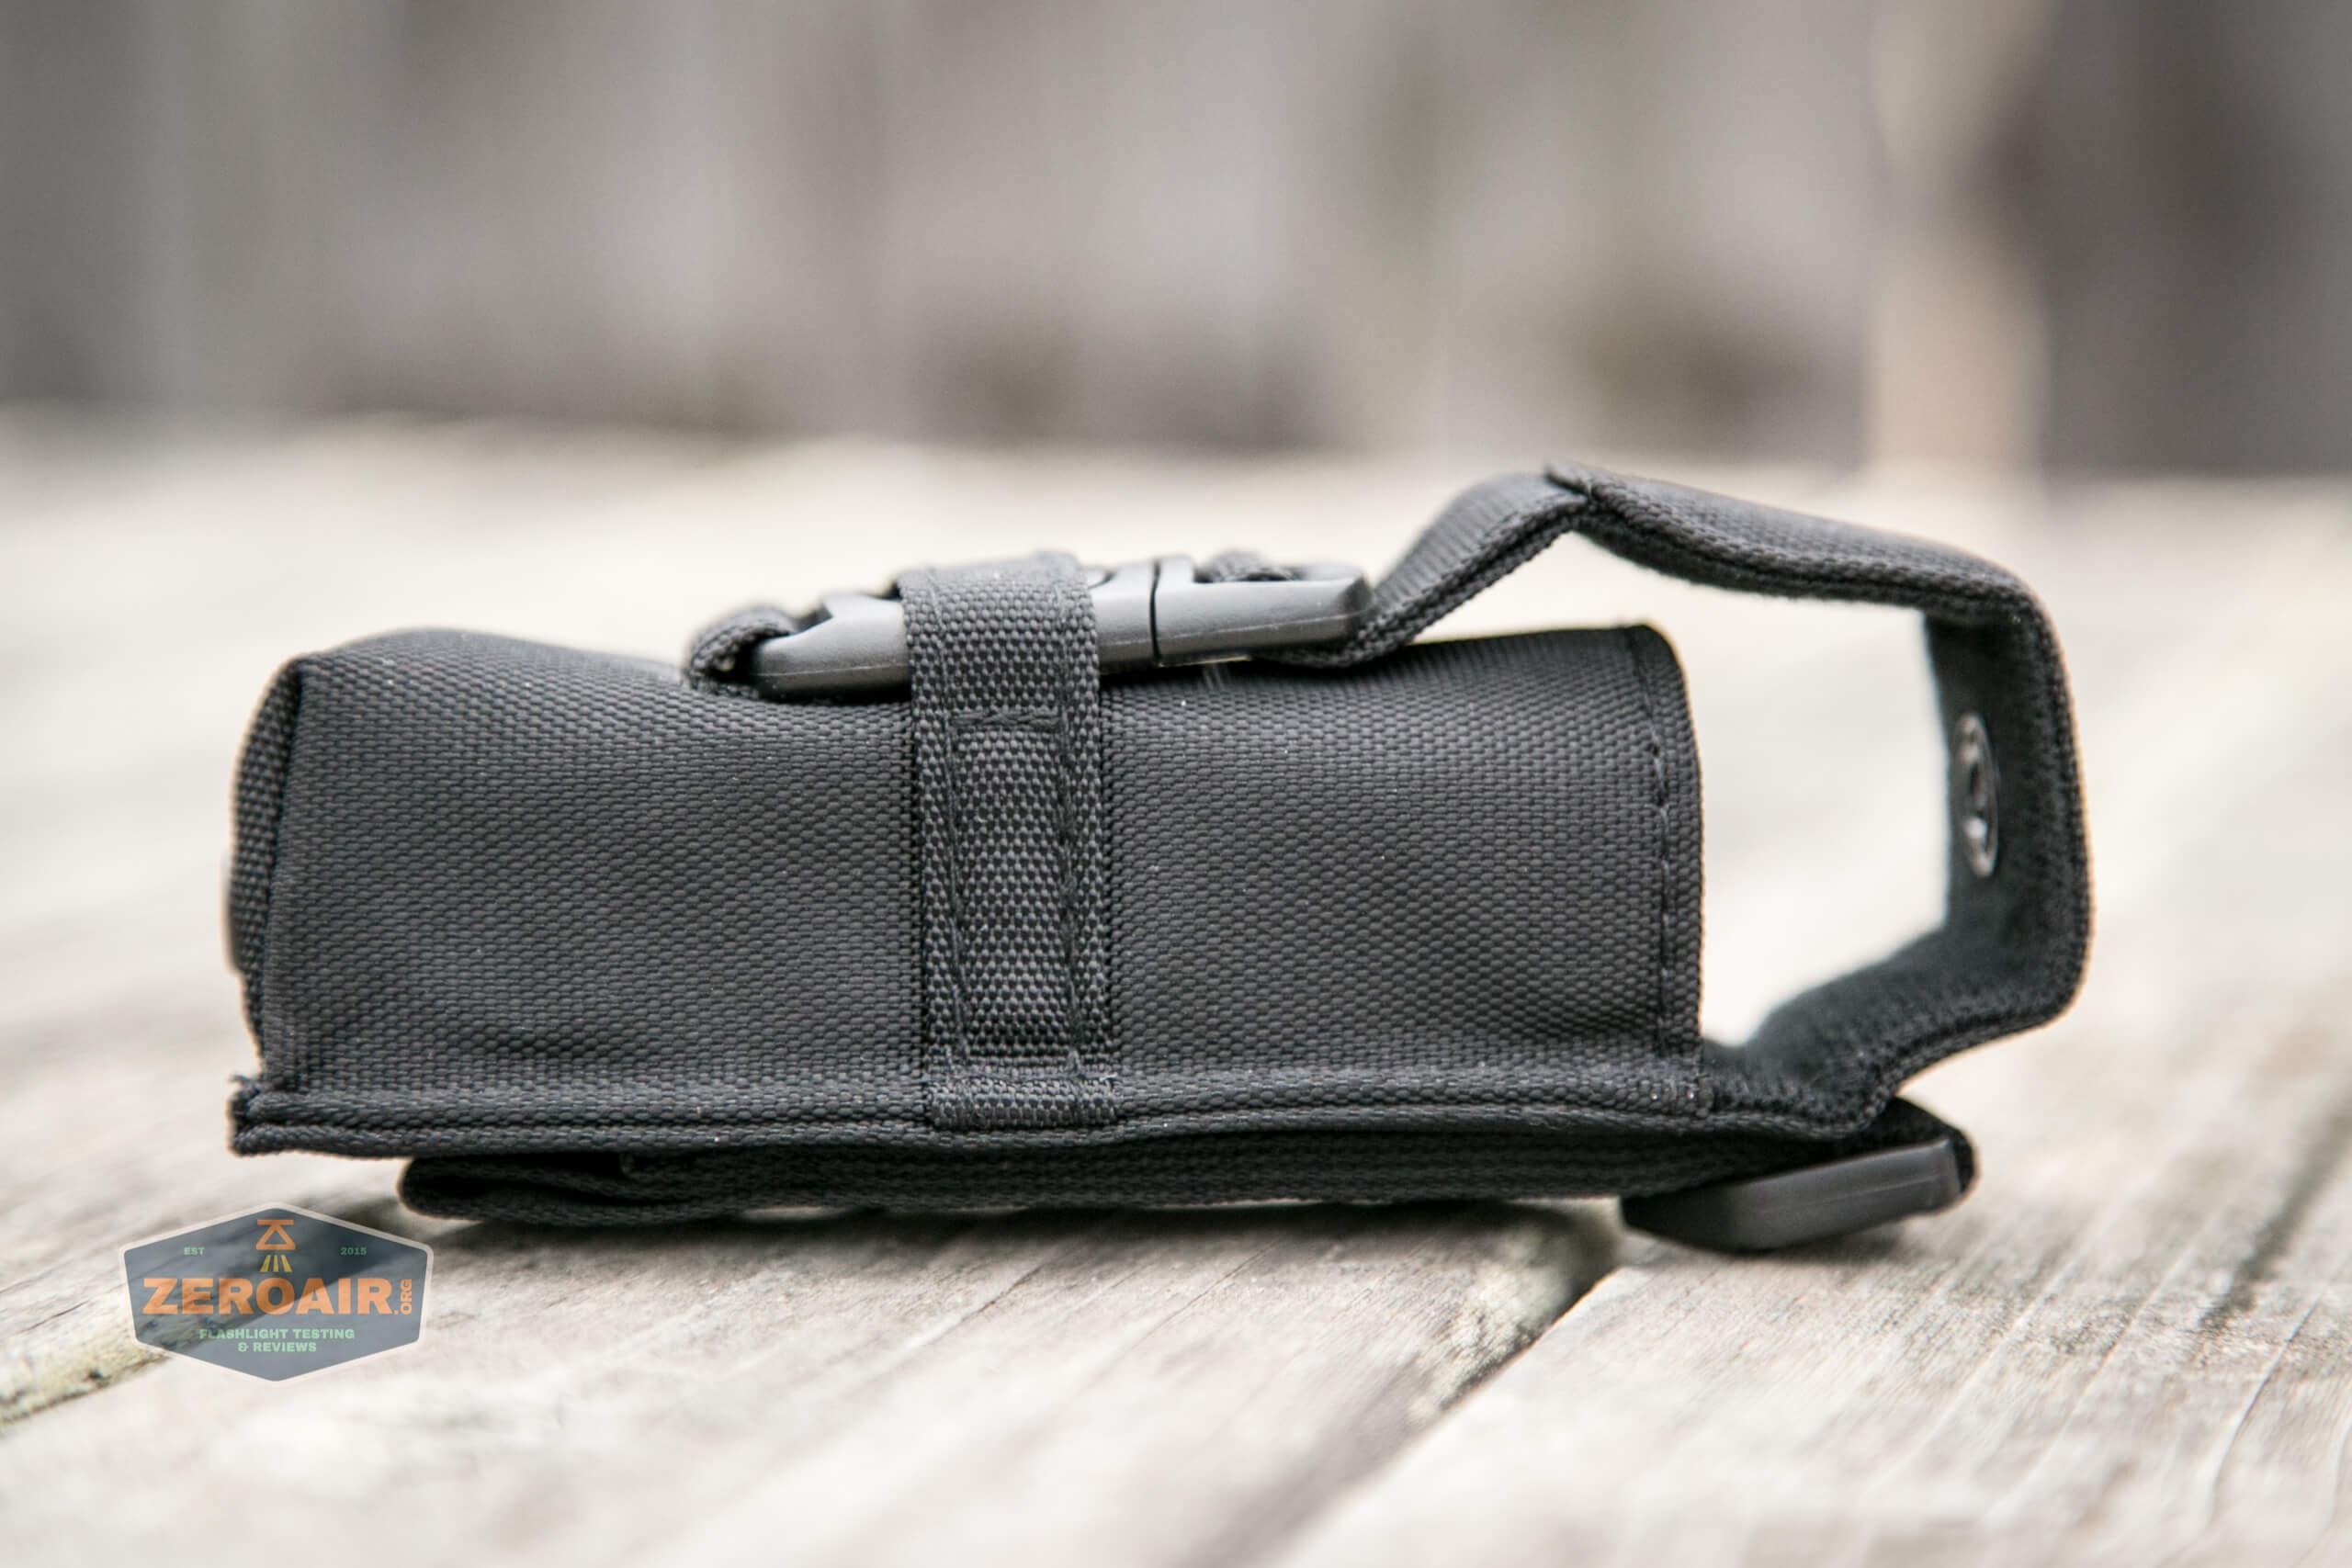 Olight M2R Pro Warrior Orange nylon pouch